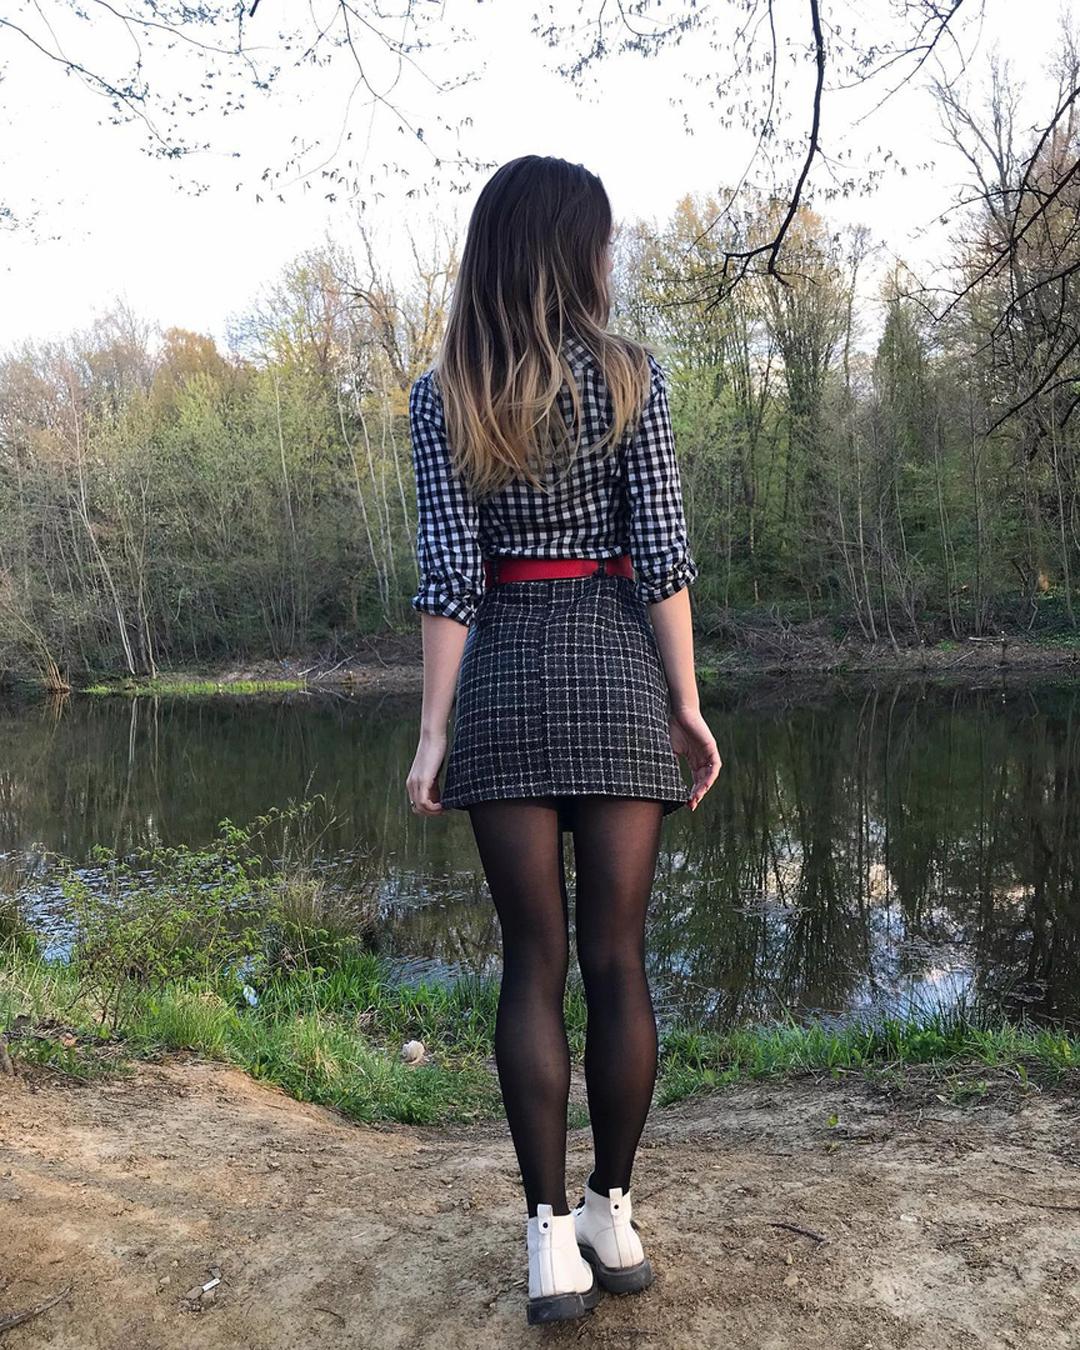 Christin-Black-Wallpapers-Insta-Fit-Bio-3